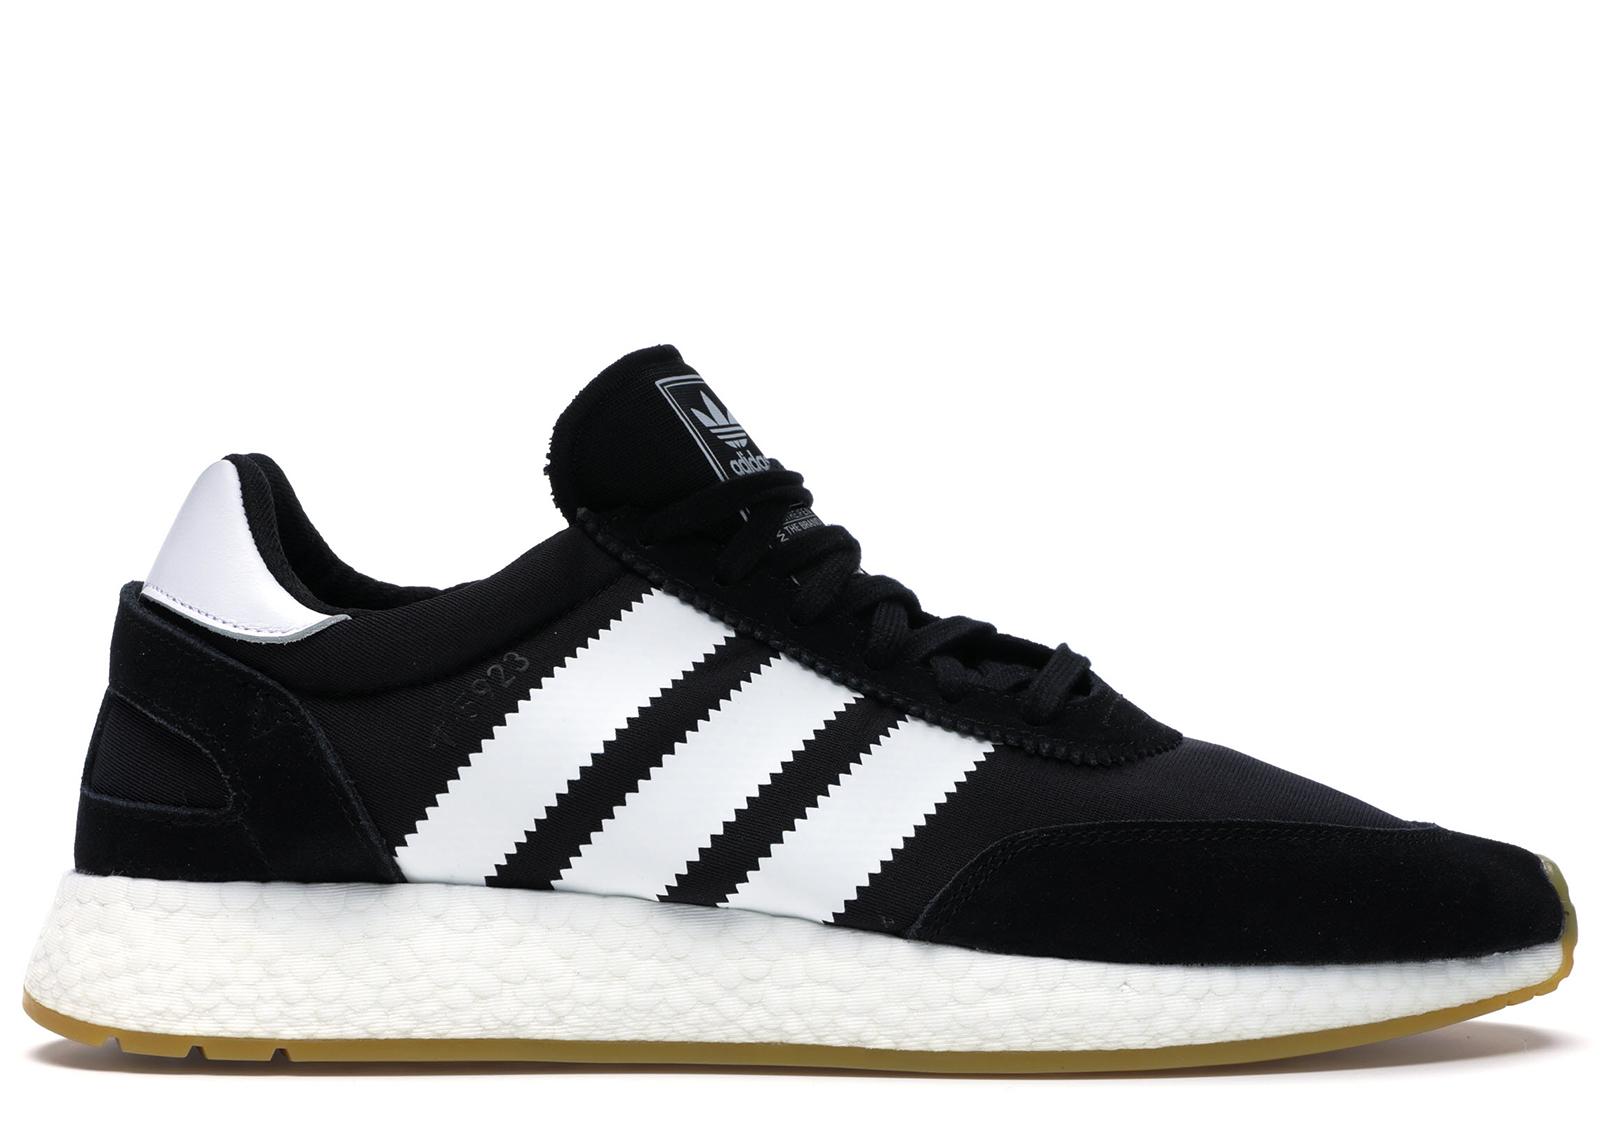 adidas I-5923 Black White Gum - D97344